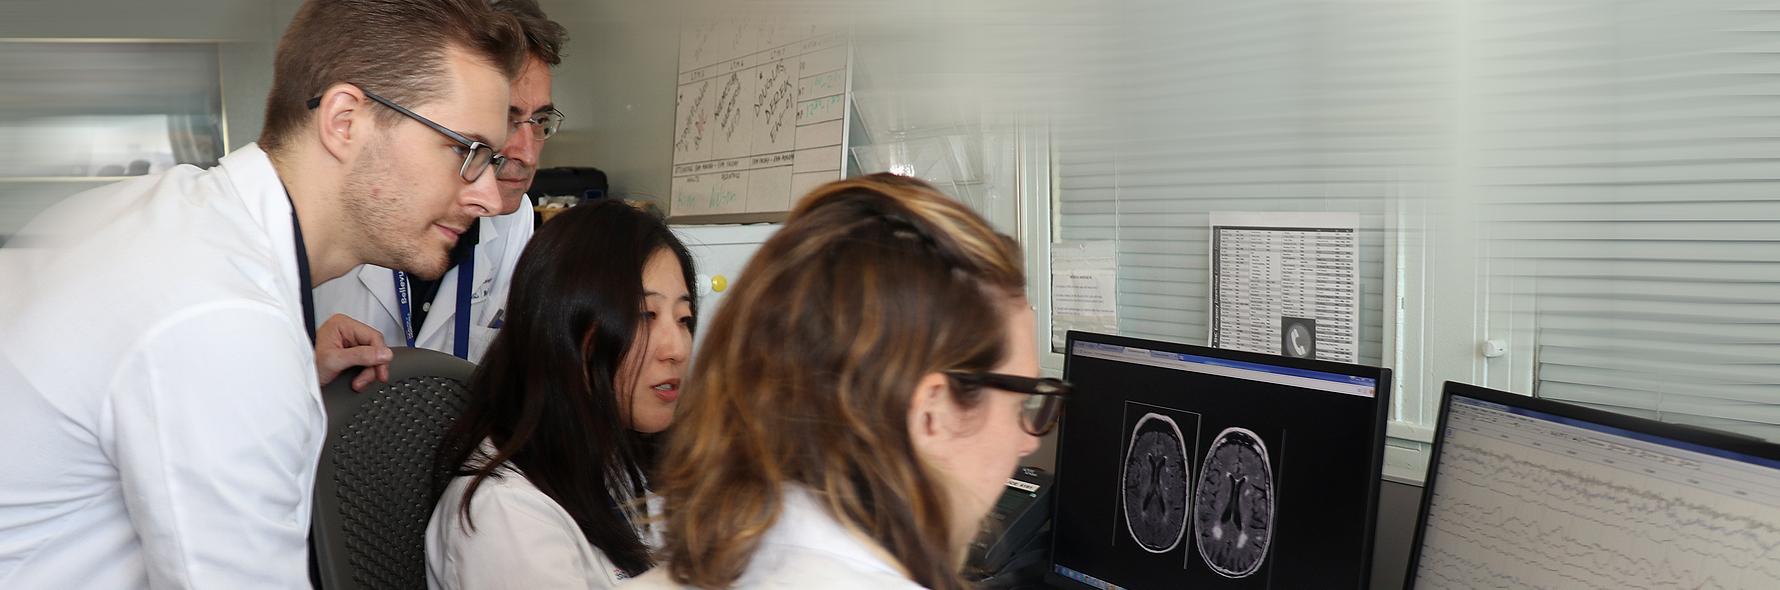 Neurology | NYC Health + Hospitals/Bellevue